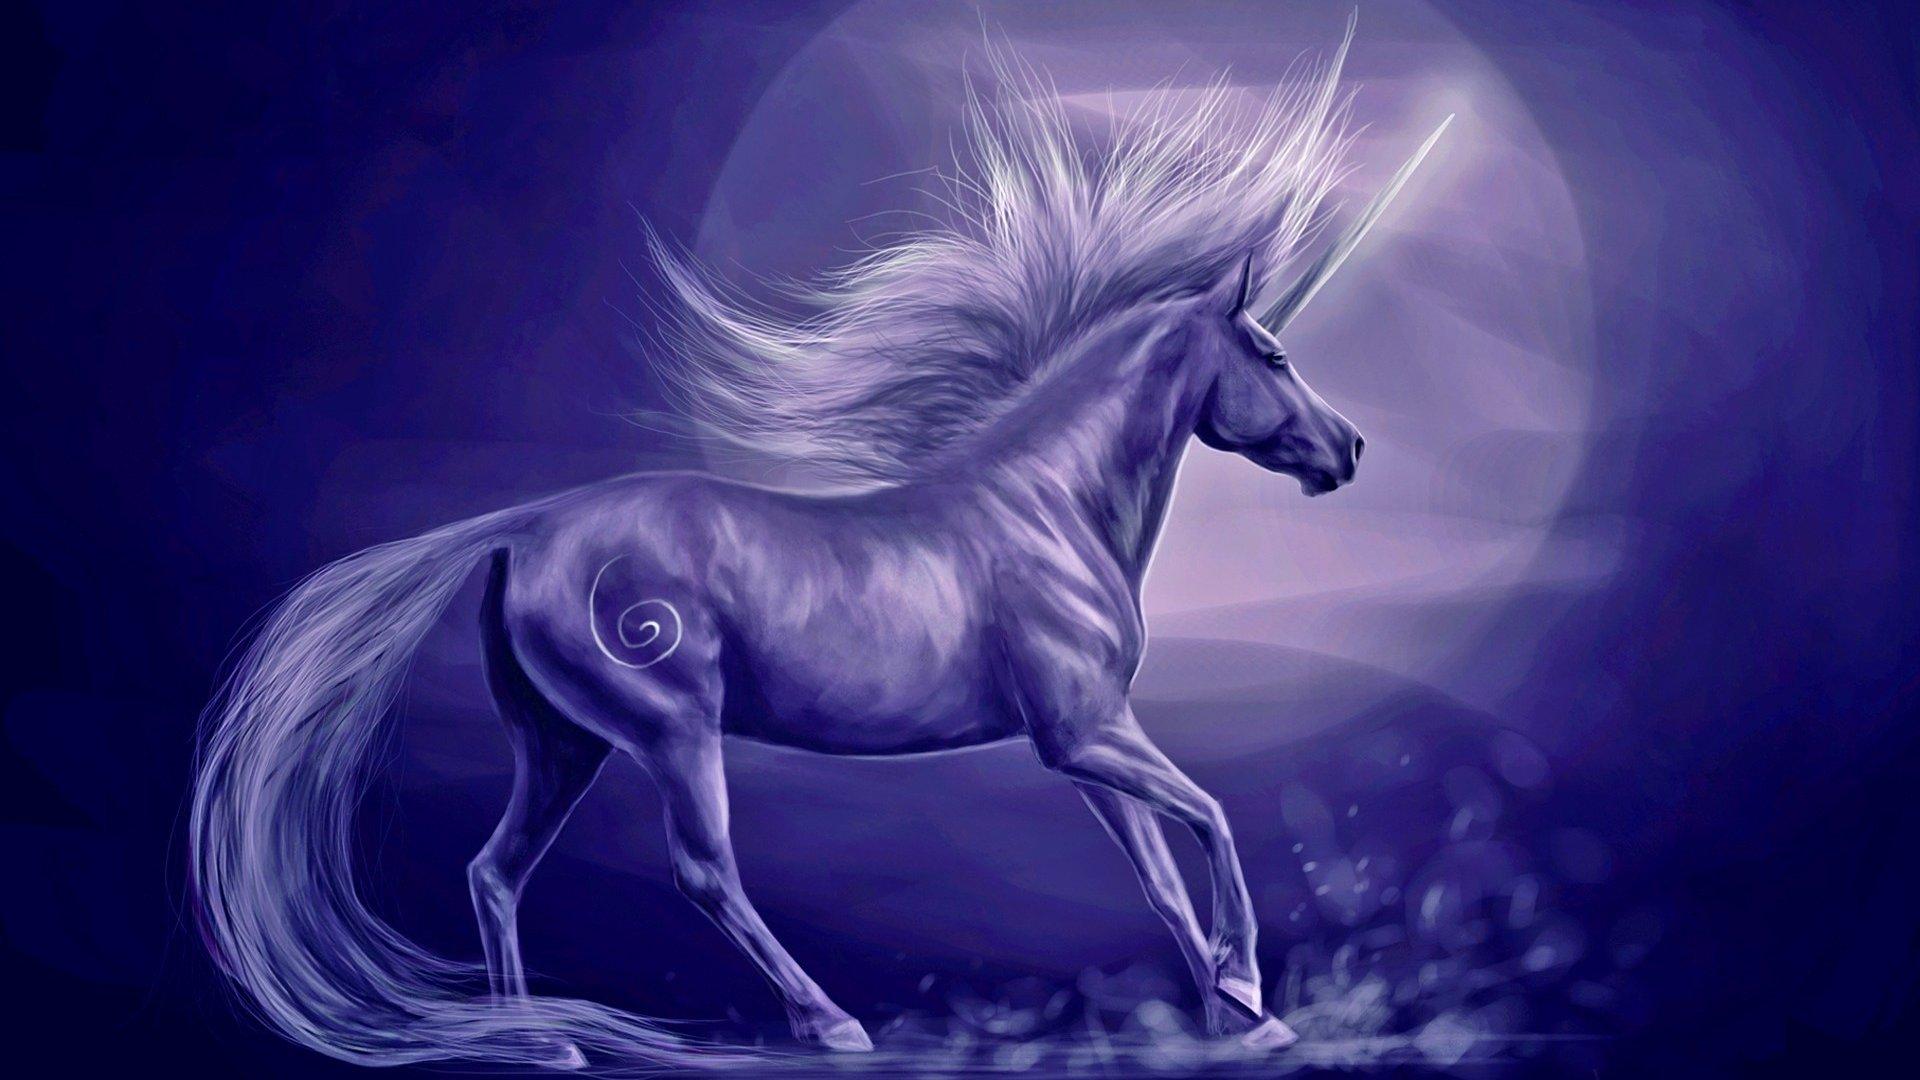 Simple Wallpaper Halloween Unicorn - unicorn-background-full-hd-1080p-408704  Image_536580.jpg